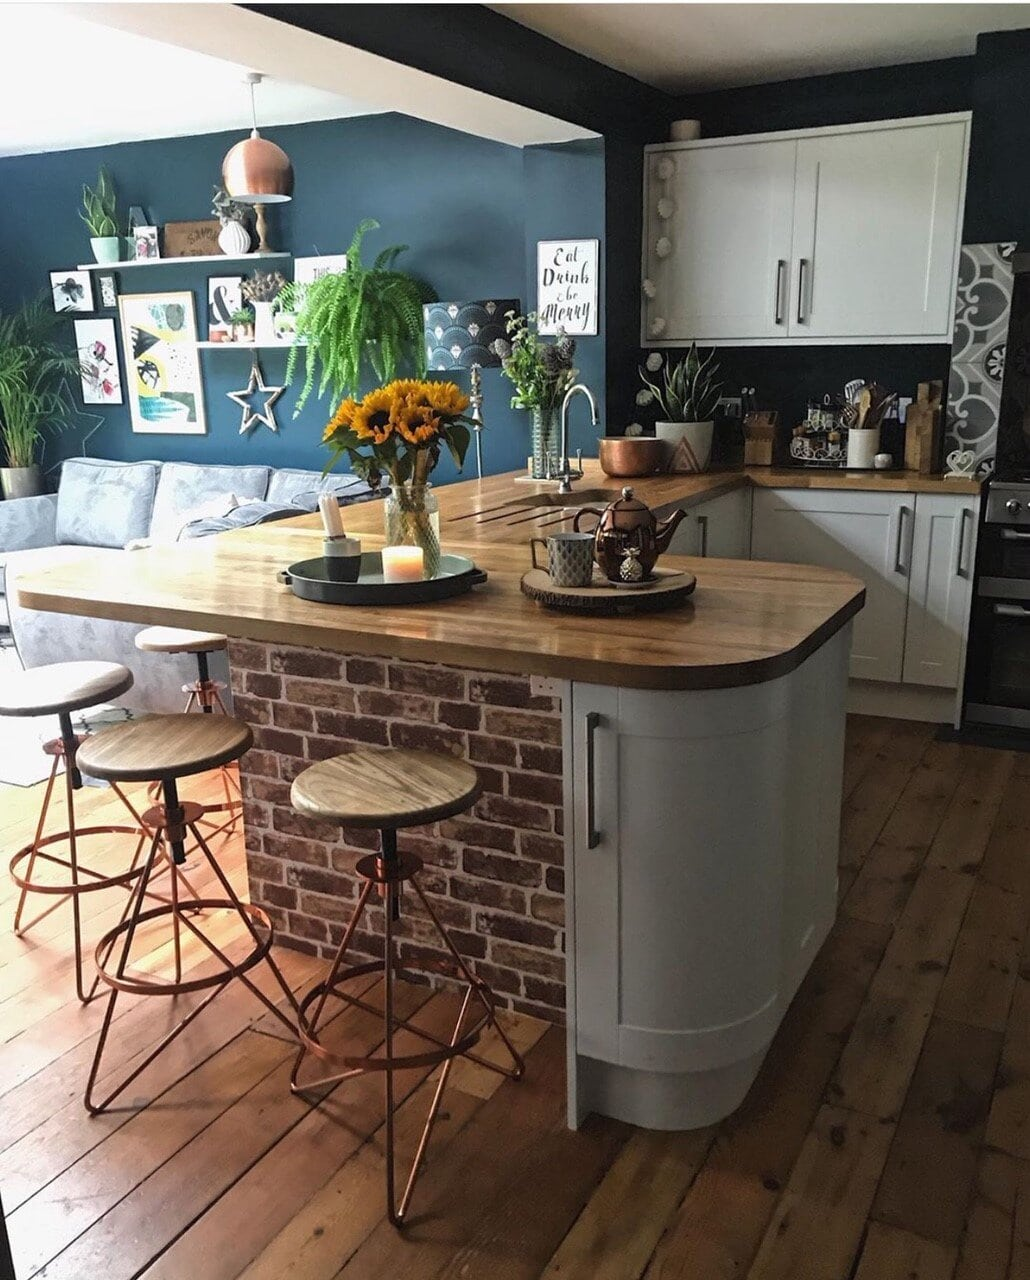 interior design, instagram, instagram trends, home decor, social media, blogging, instagram advice, blogging advice, pinterest, kitchen, sunflowers